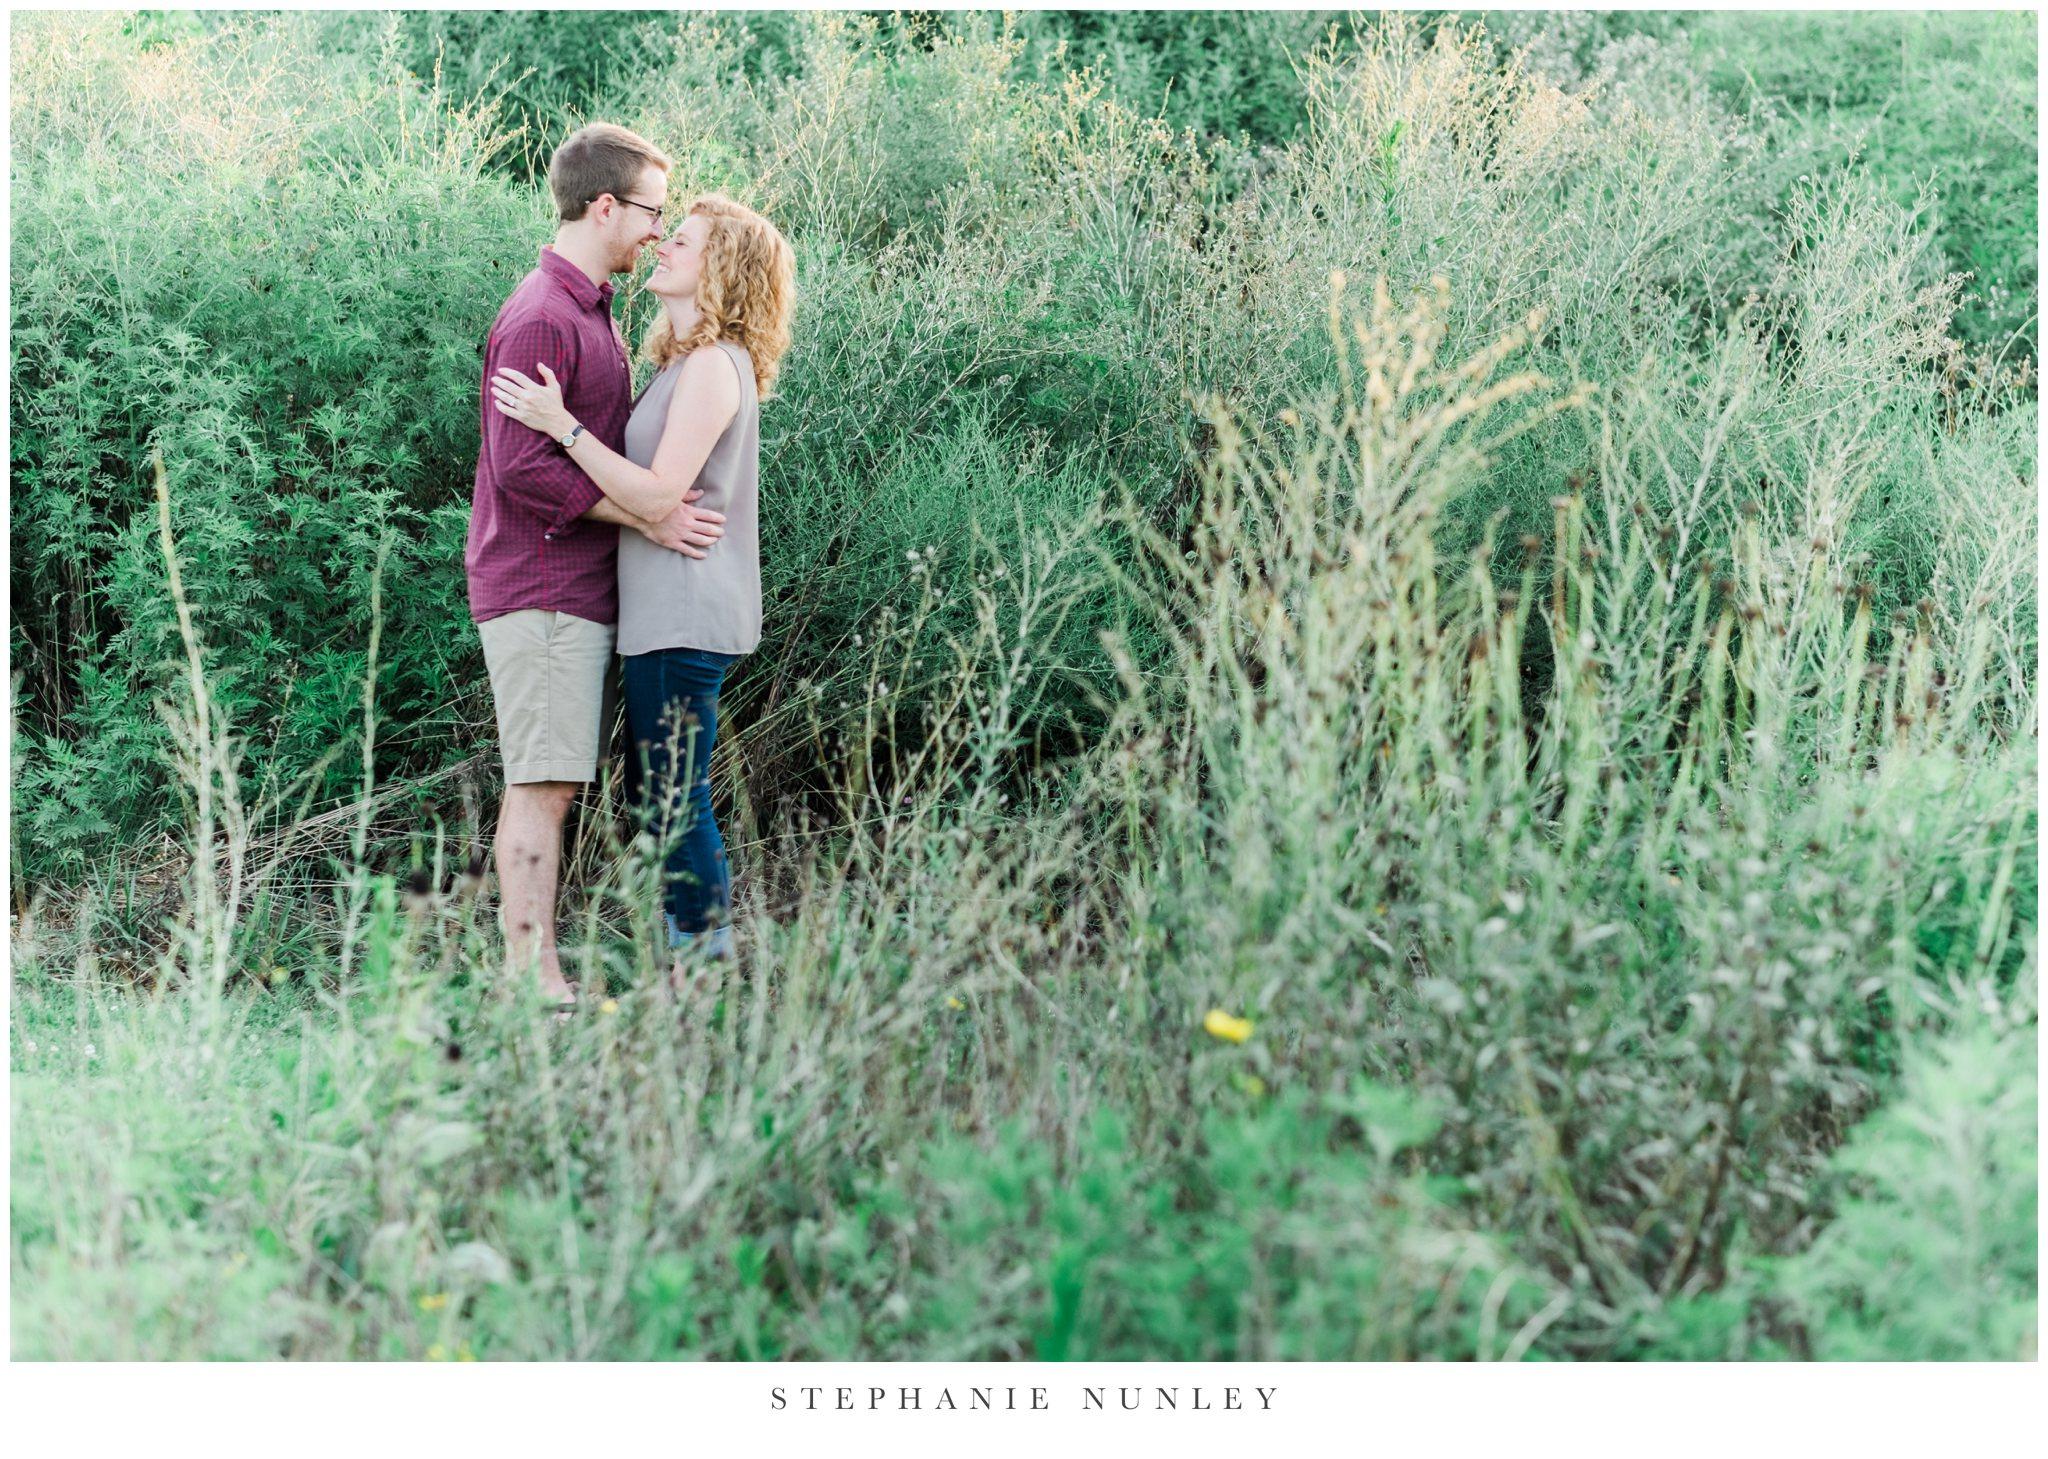 bentonville-arkansas-classic-engagement-photos-0033.jpg